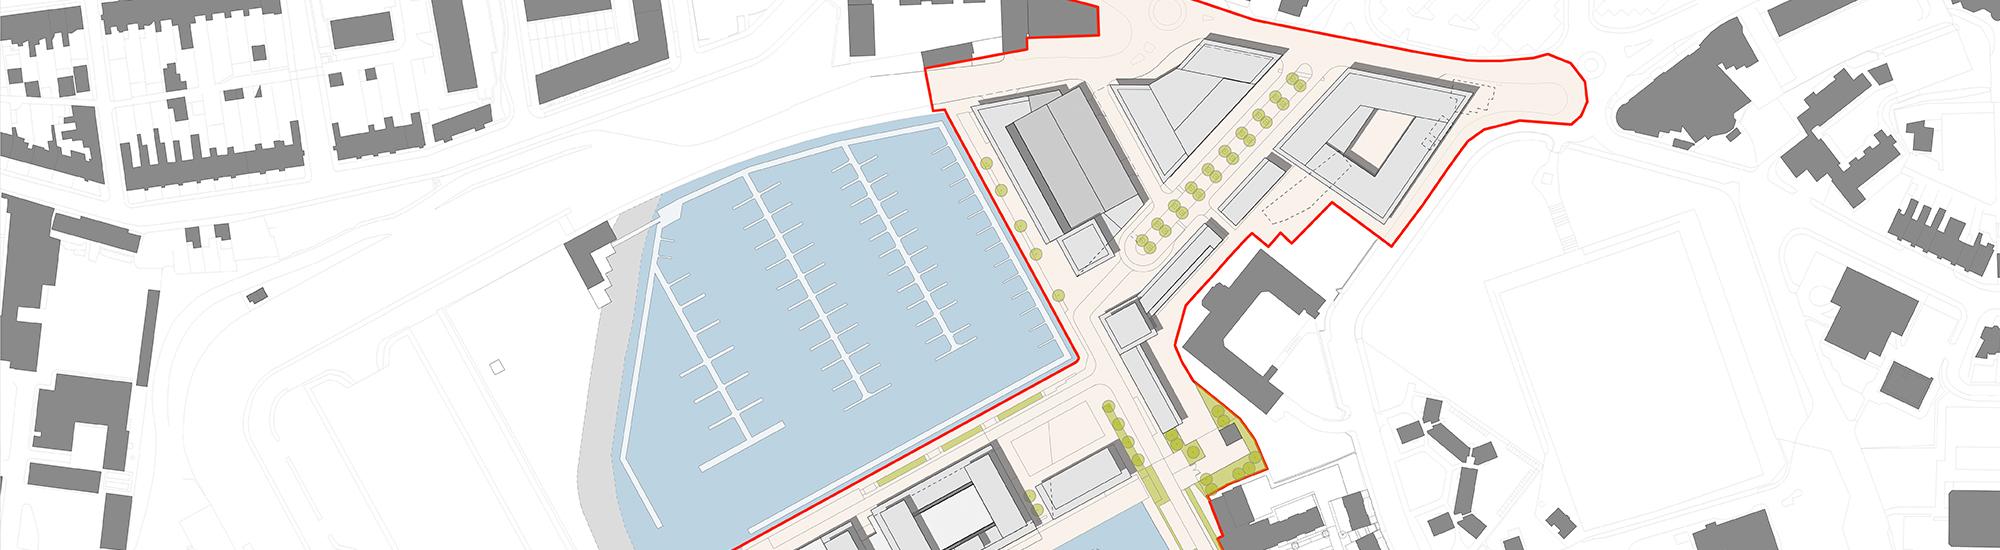 Millbay Masterplan